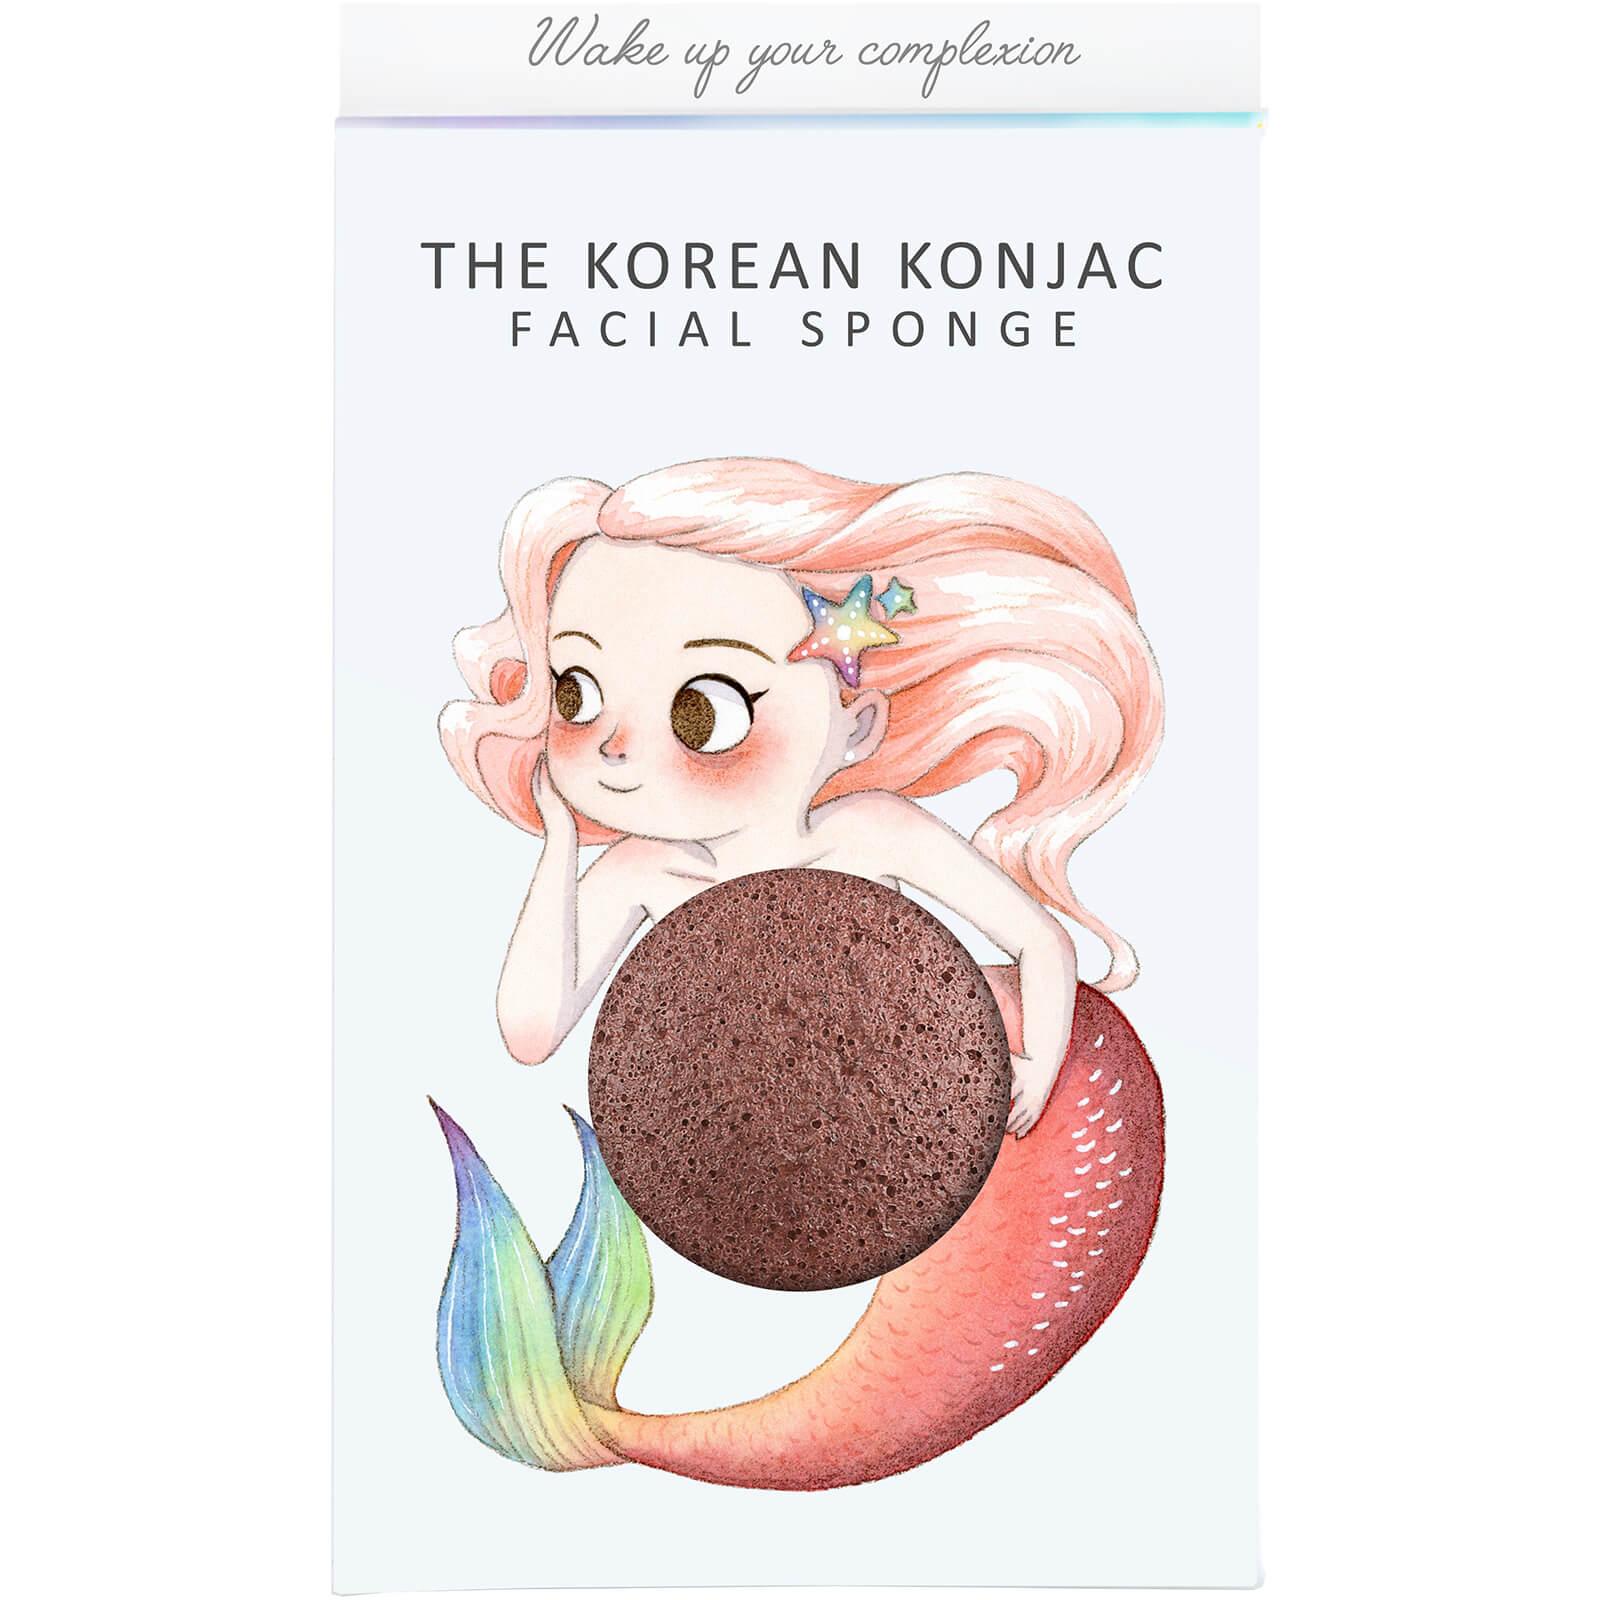 The Konjac Sponge Company Éponge Konjac, Boîte et Crochet Mythical Mermaid The Konjac Sponge Company 30g – Argile Rouge